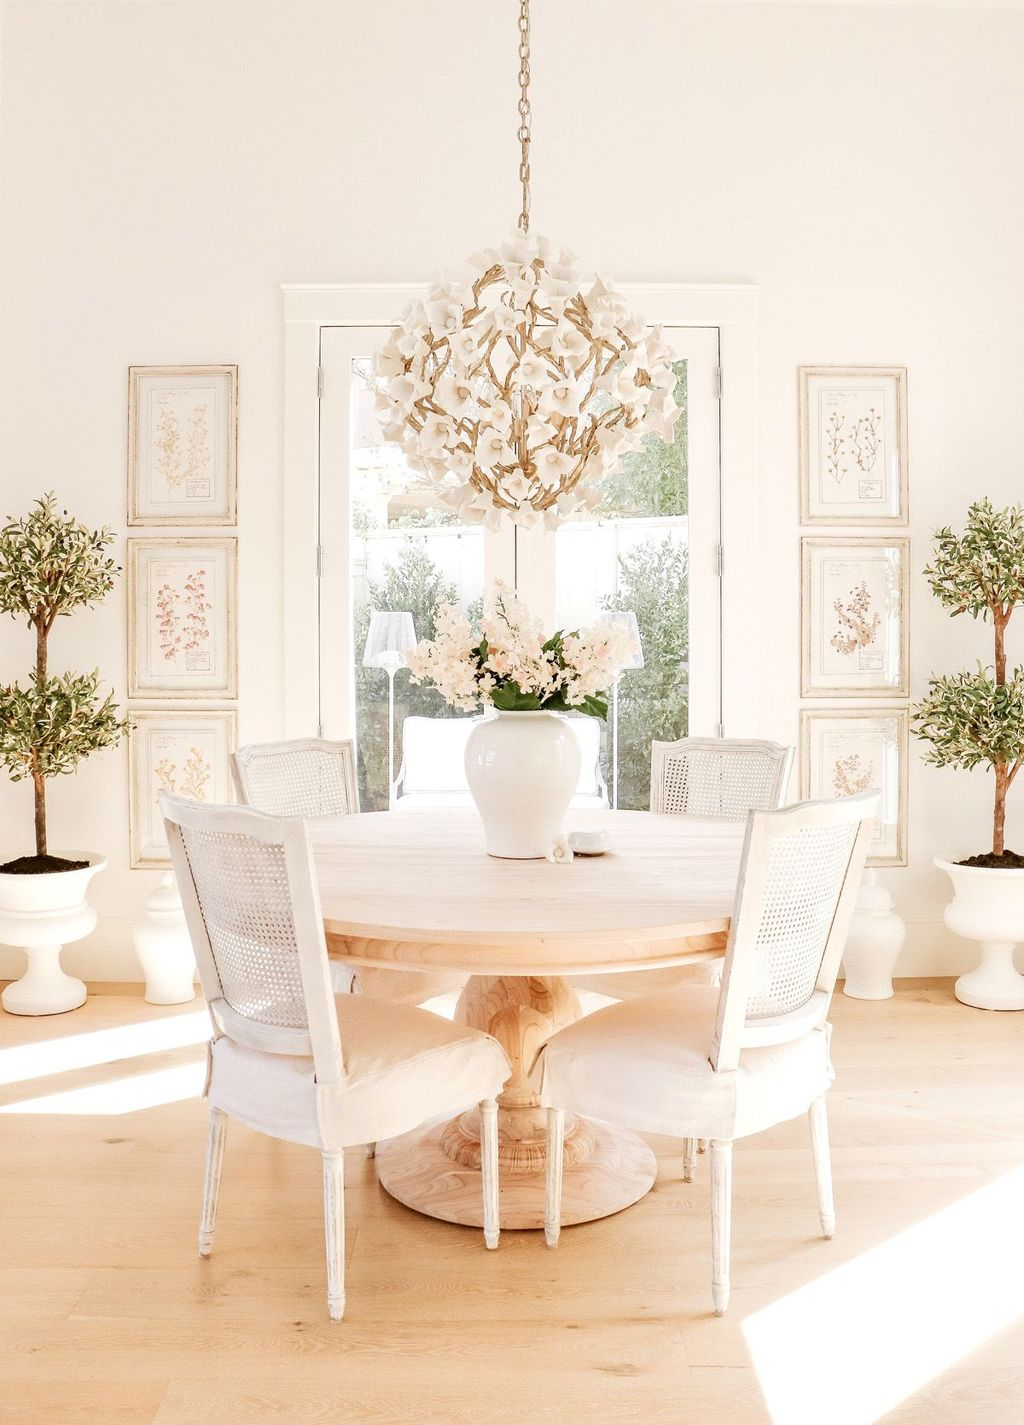 Popular Modern Dining Room Design Ideas You Should Copy 29